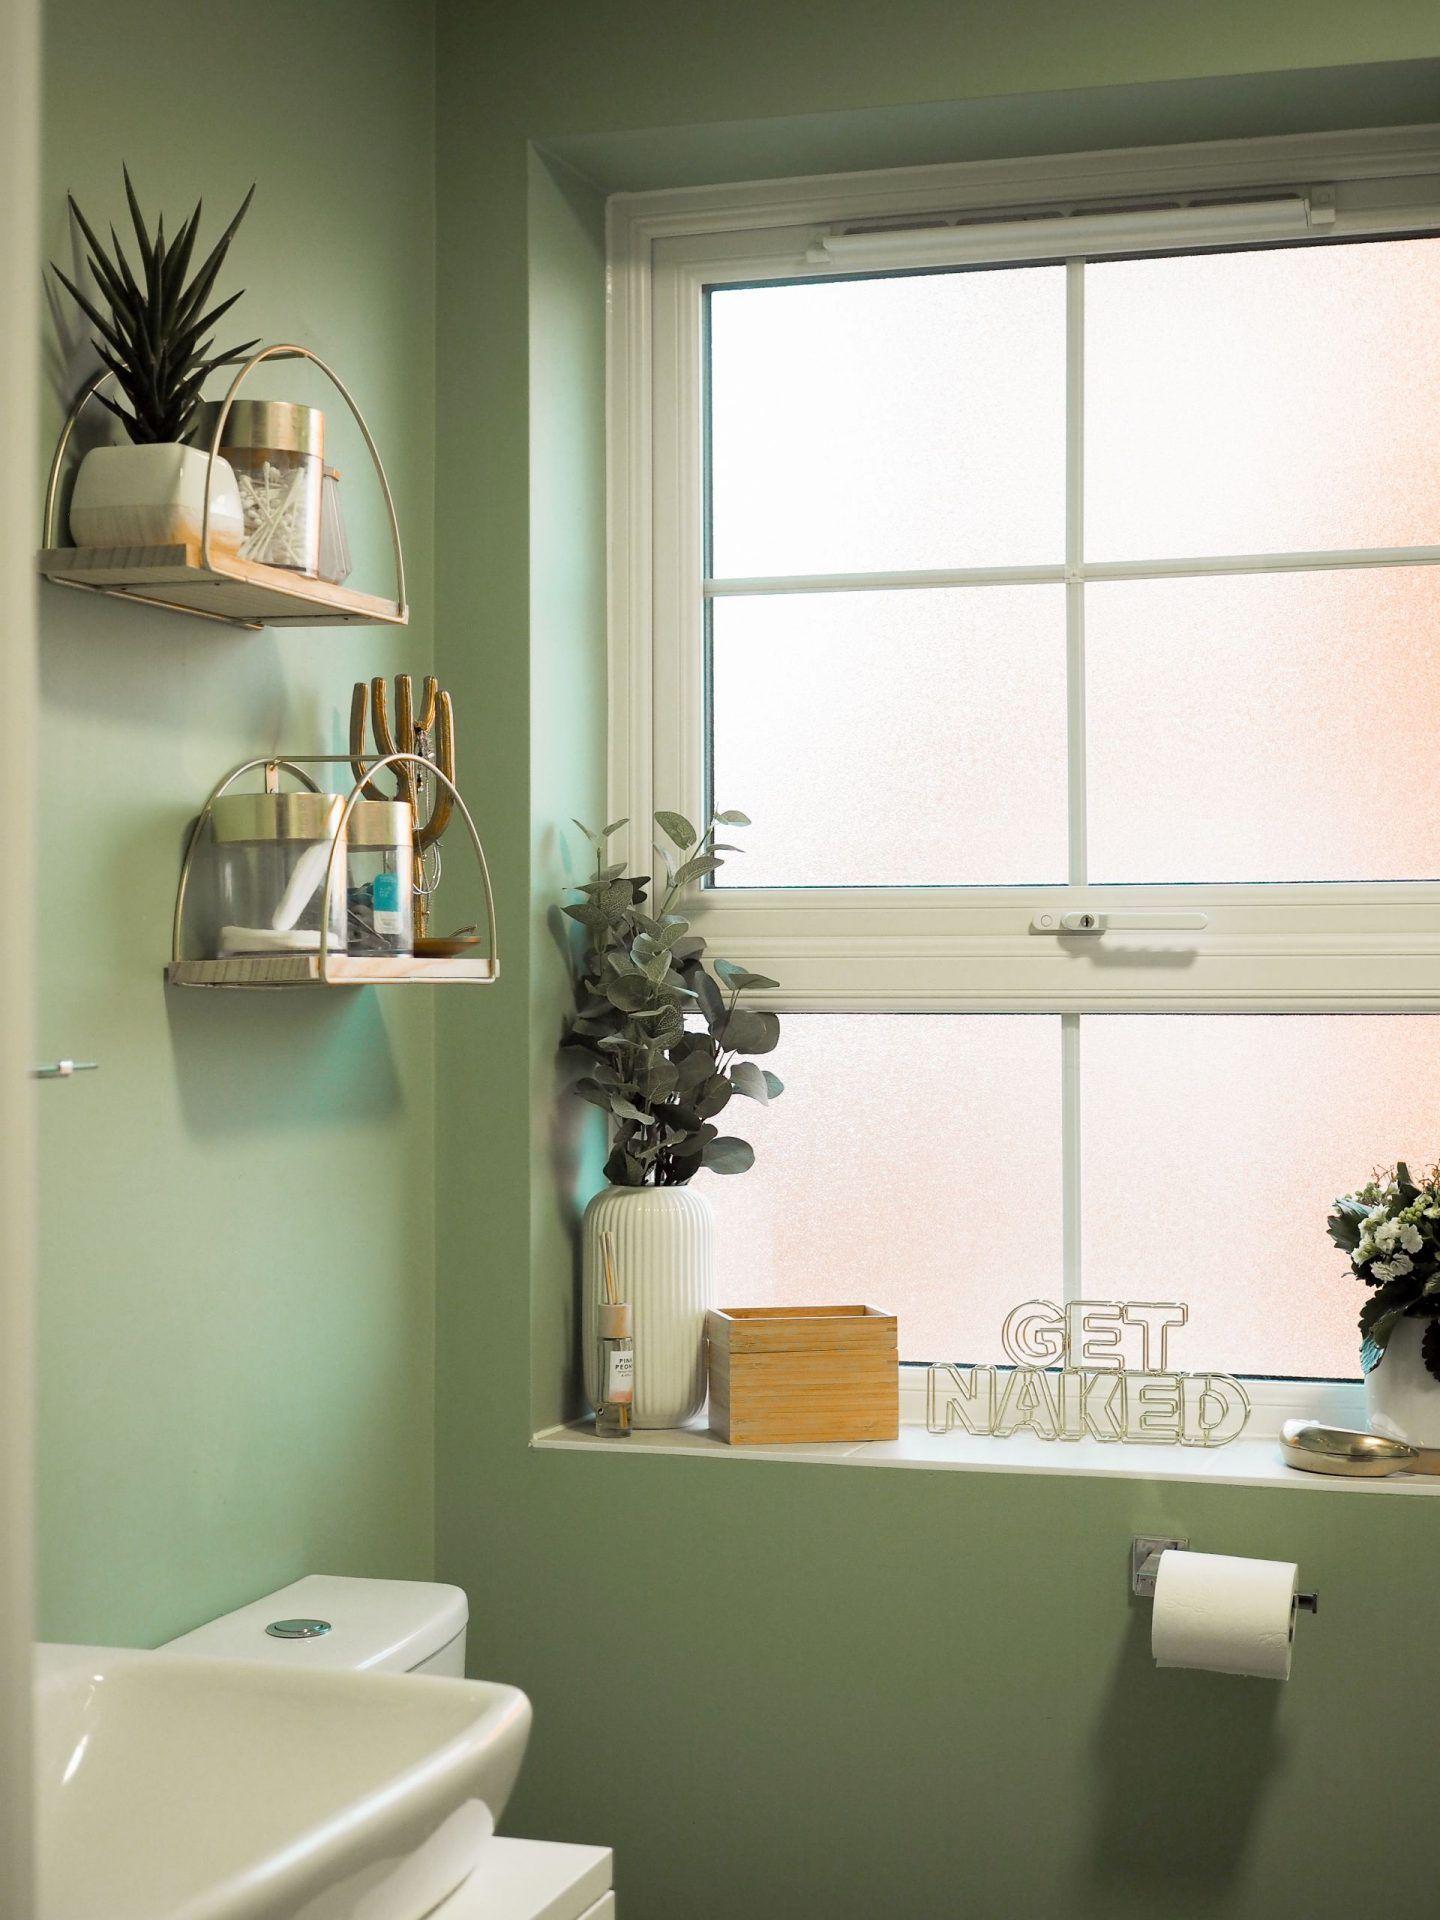 A Sage Green Bathroom New Build Makeover Creating A Calm Space Green Bathroom Decor Green Bathroom Bathrooms Remodel Sage green bathroom decor